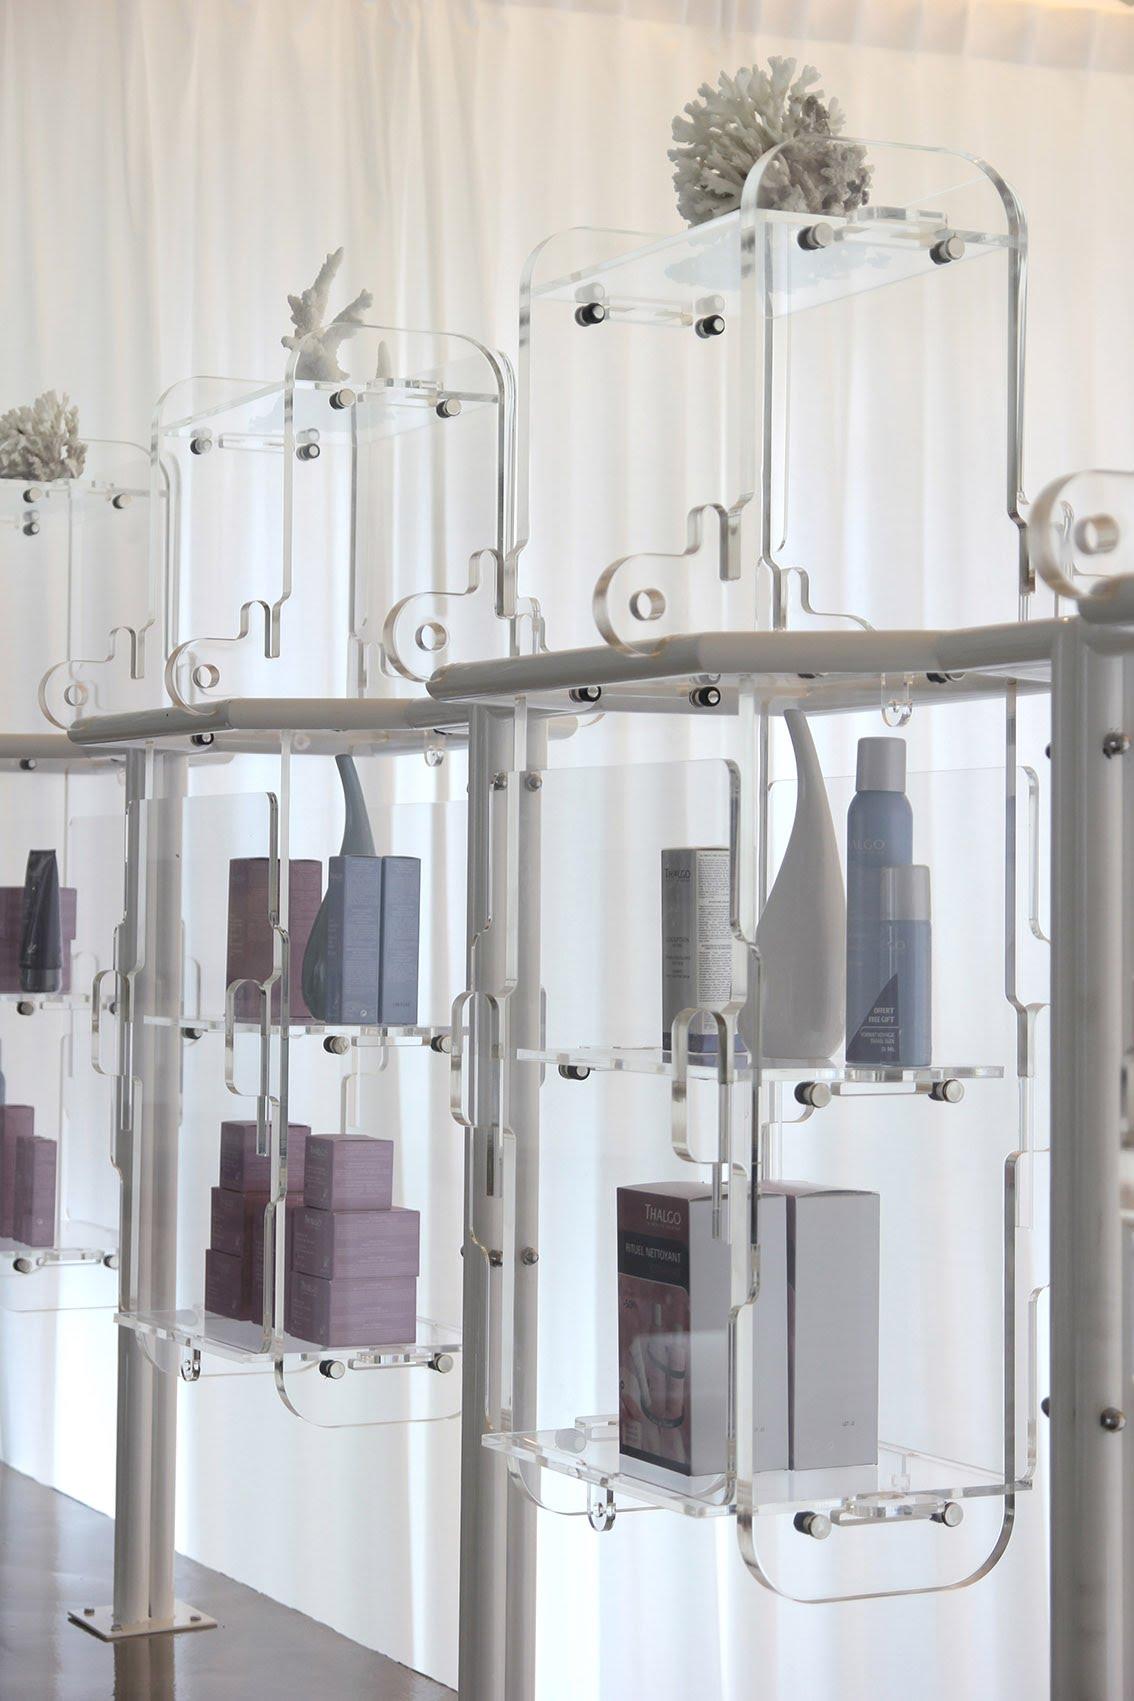 2016 Infinity Spa Spacepopular Keypad Wiring Diagram Display Cabinet On The Mezzanine Integrated Into Bespoke Railing